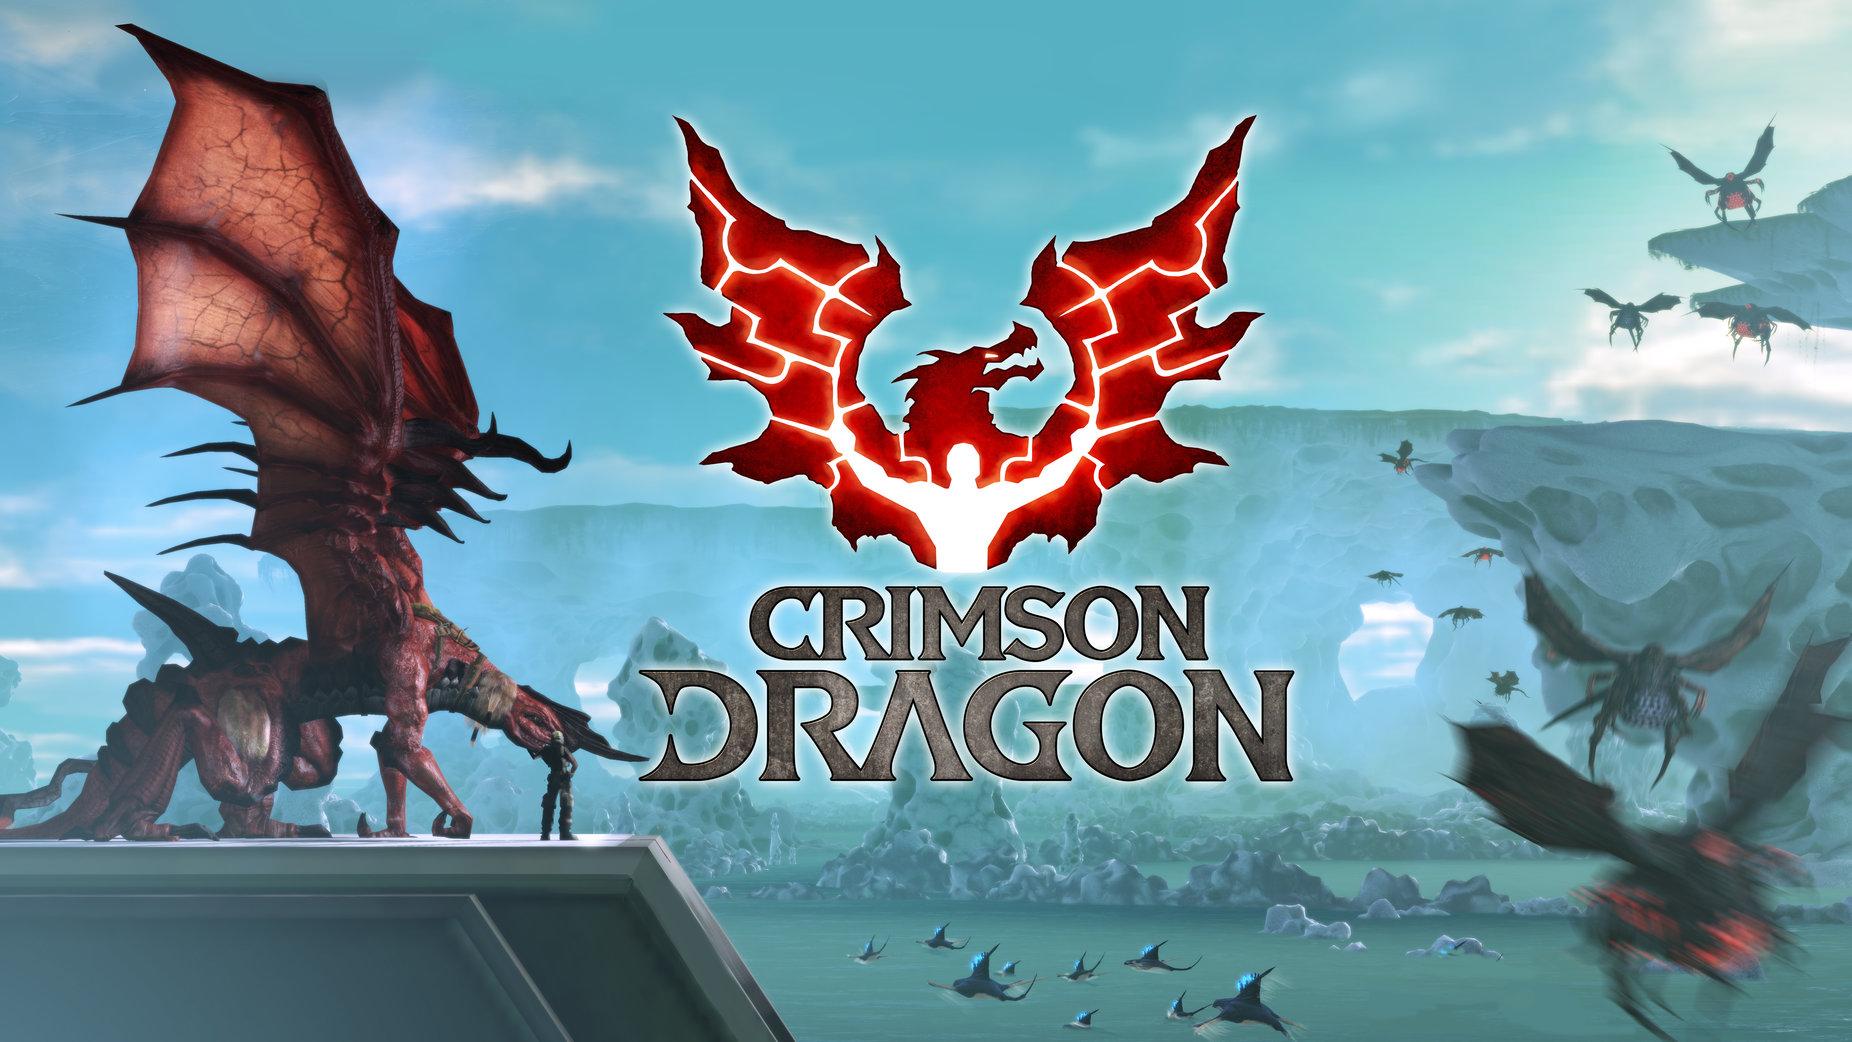 Crimson-Dragon-1